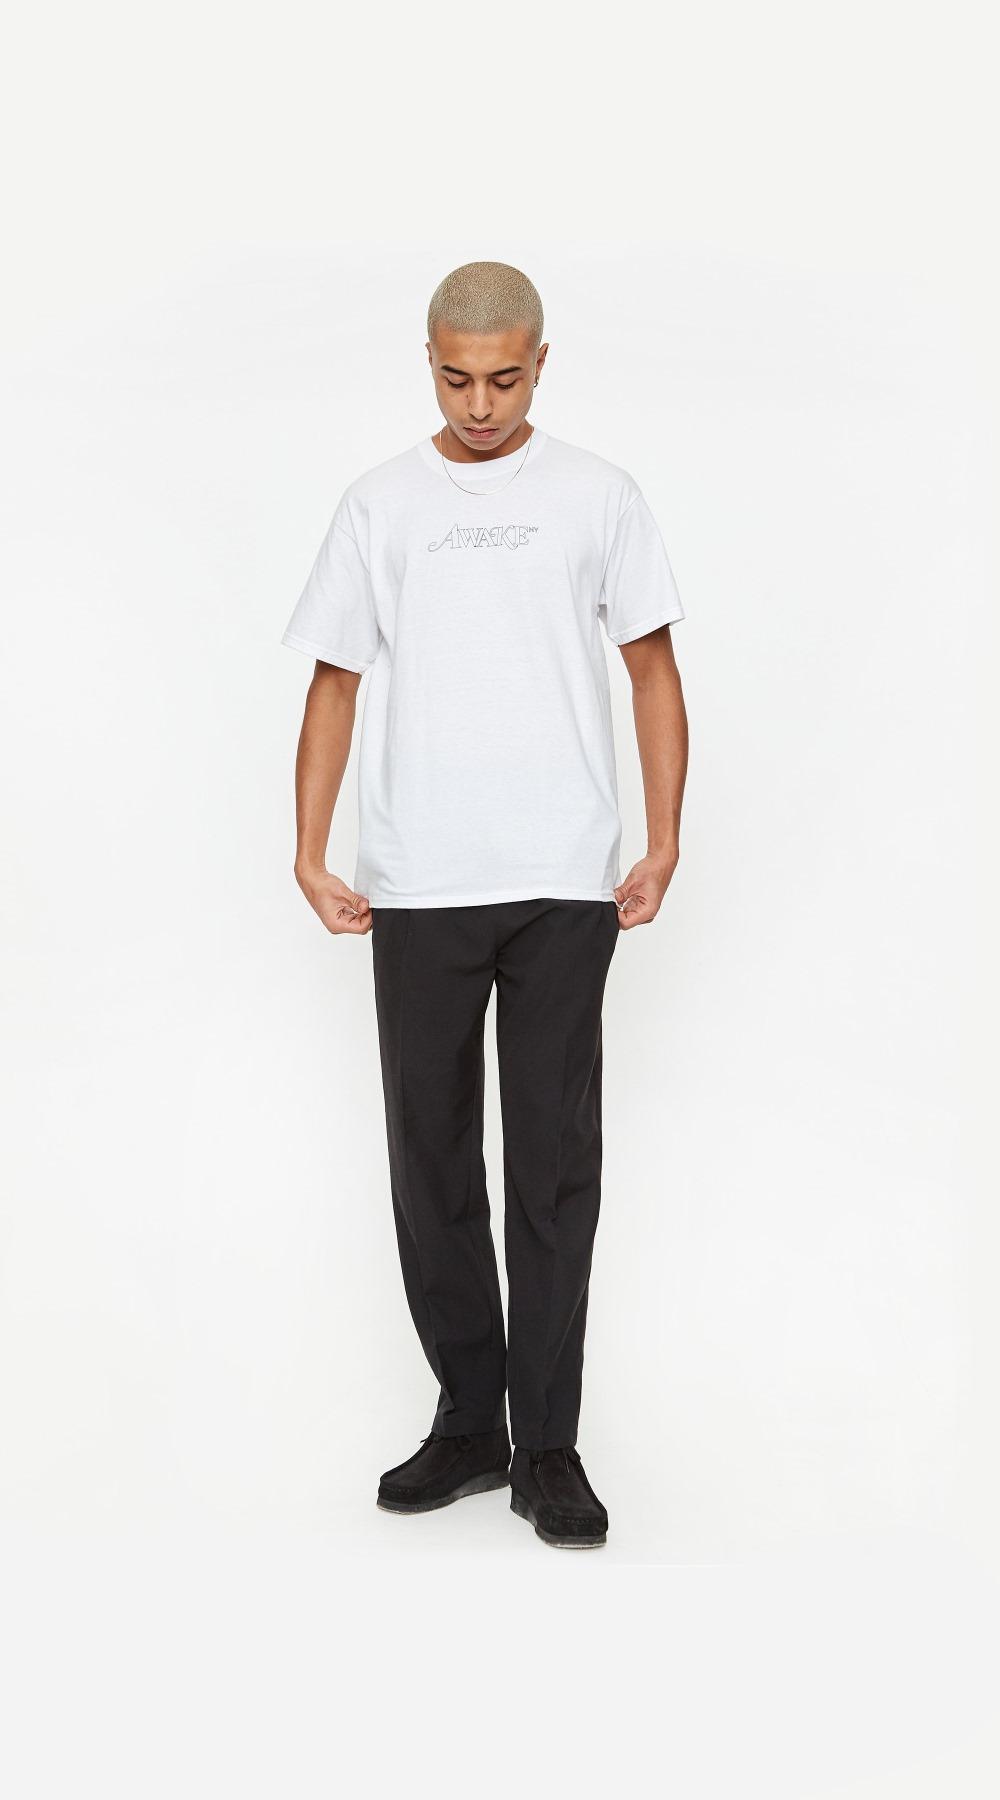 Awake Classic Outline Logo T shirt White 3